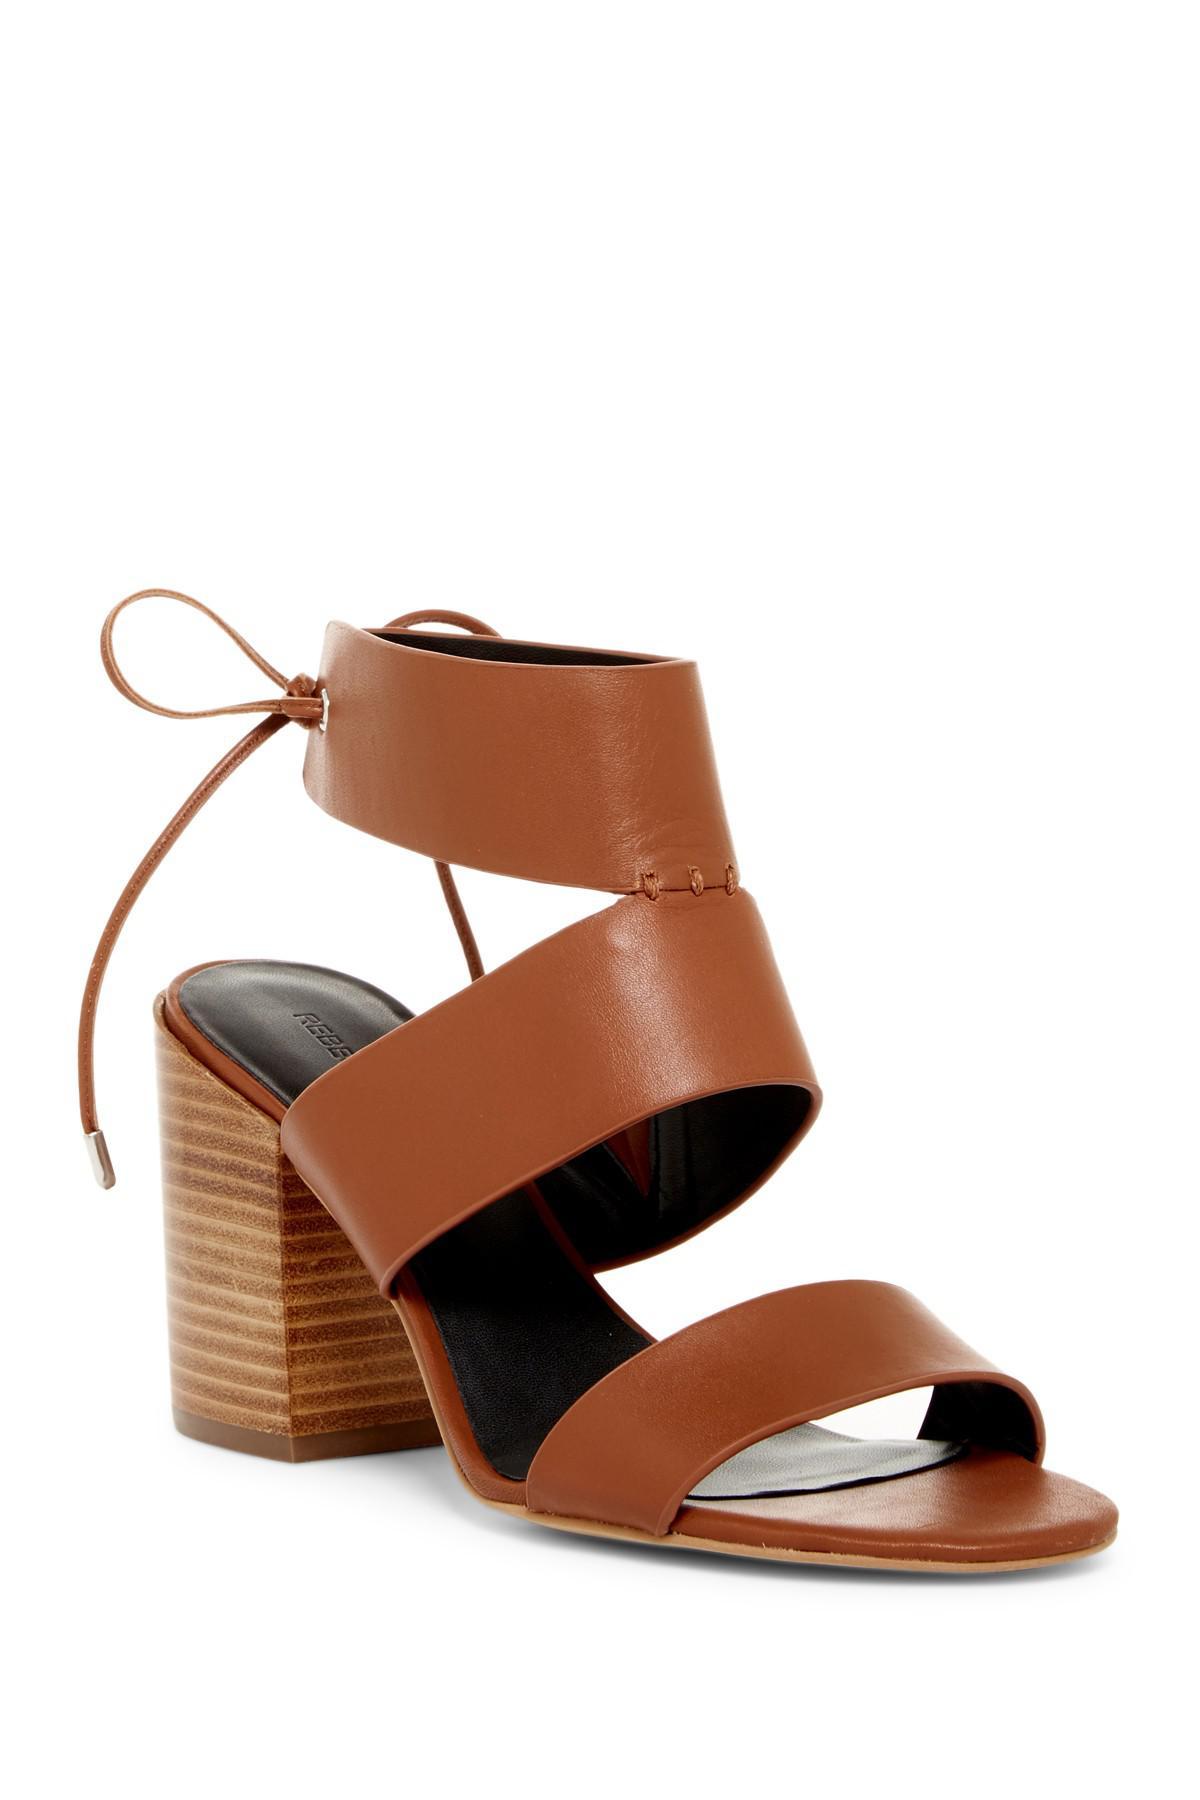 8b8eafe5706 Lyst - Rebecca Minkoff Christy Back Lace-up Sandal in Brown